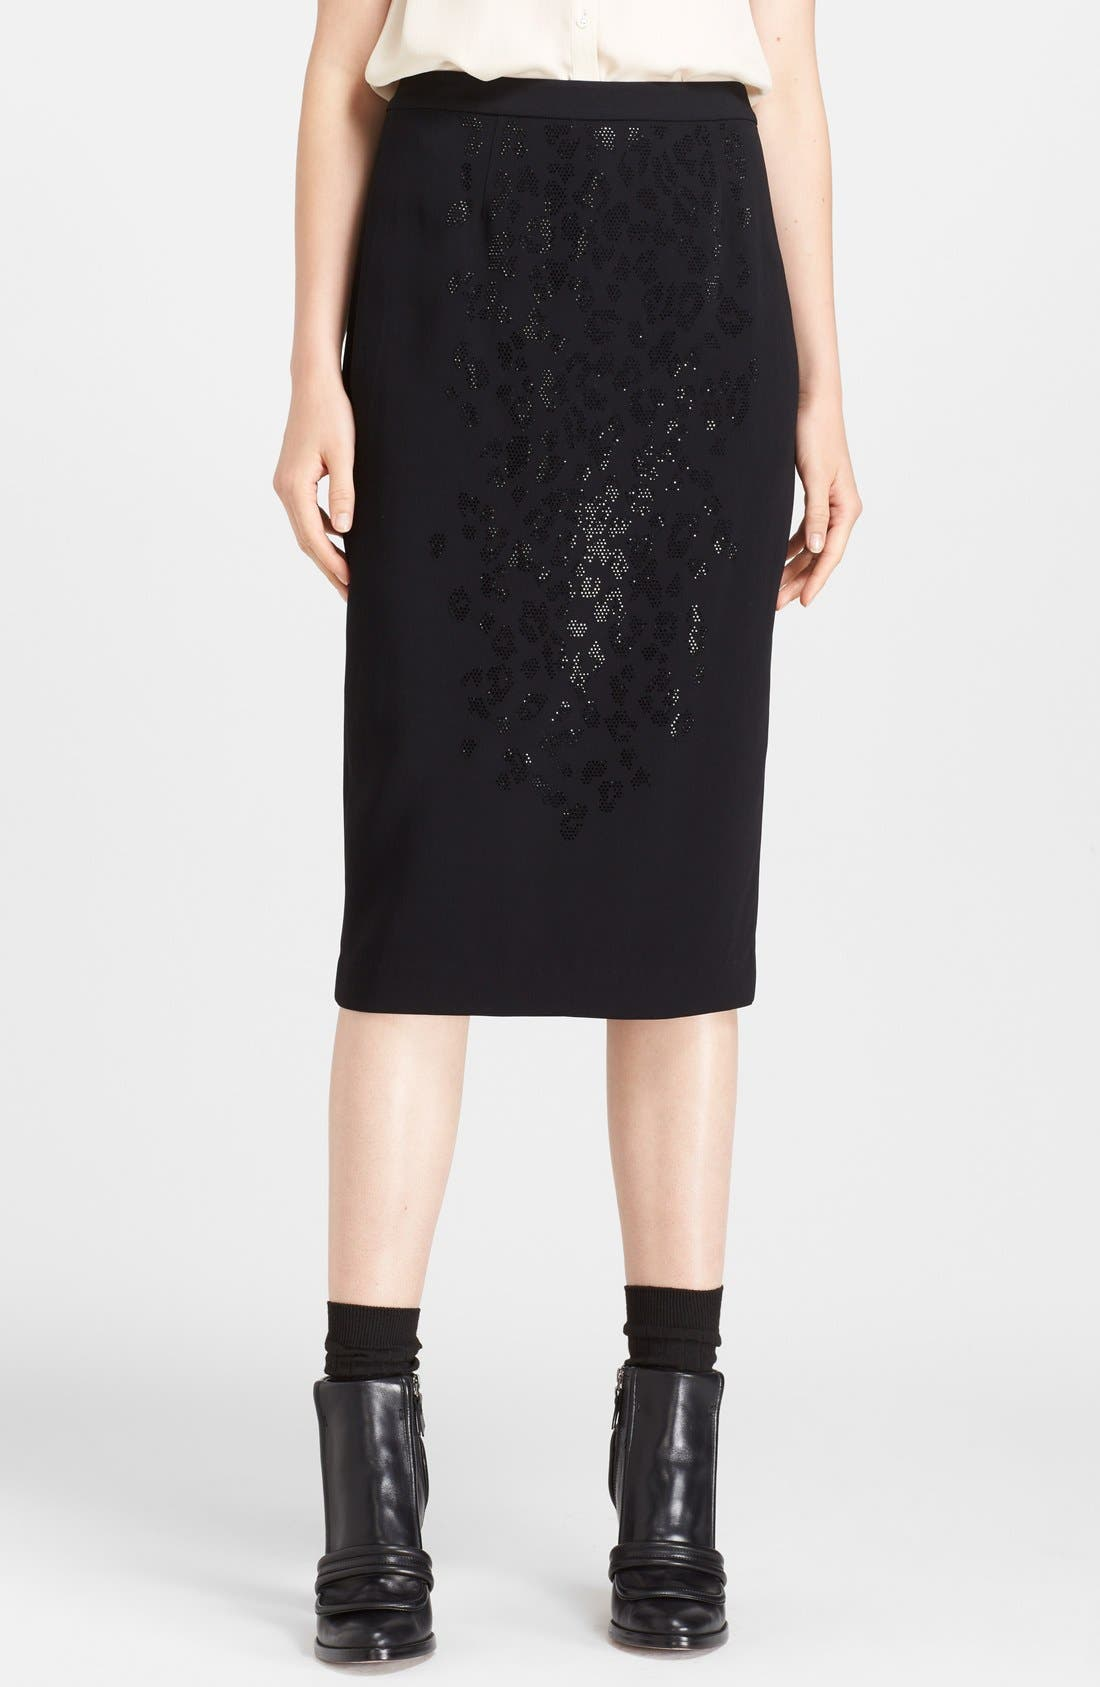 Alternate Image 1 Selected - A.L.C. 'Lee' Pencil Skirt